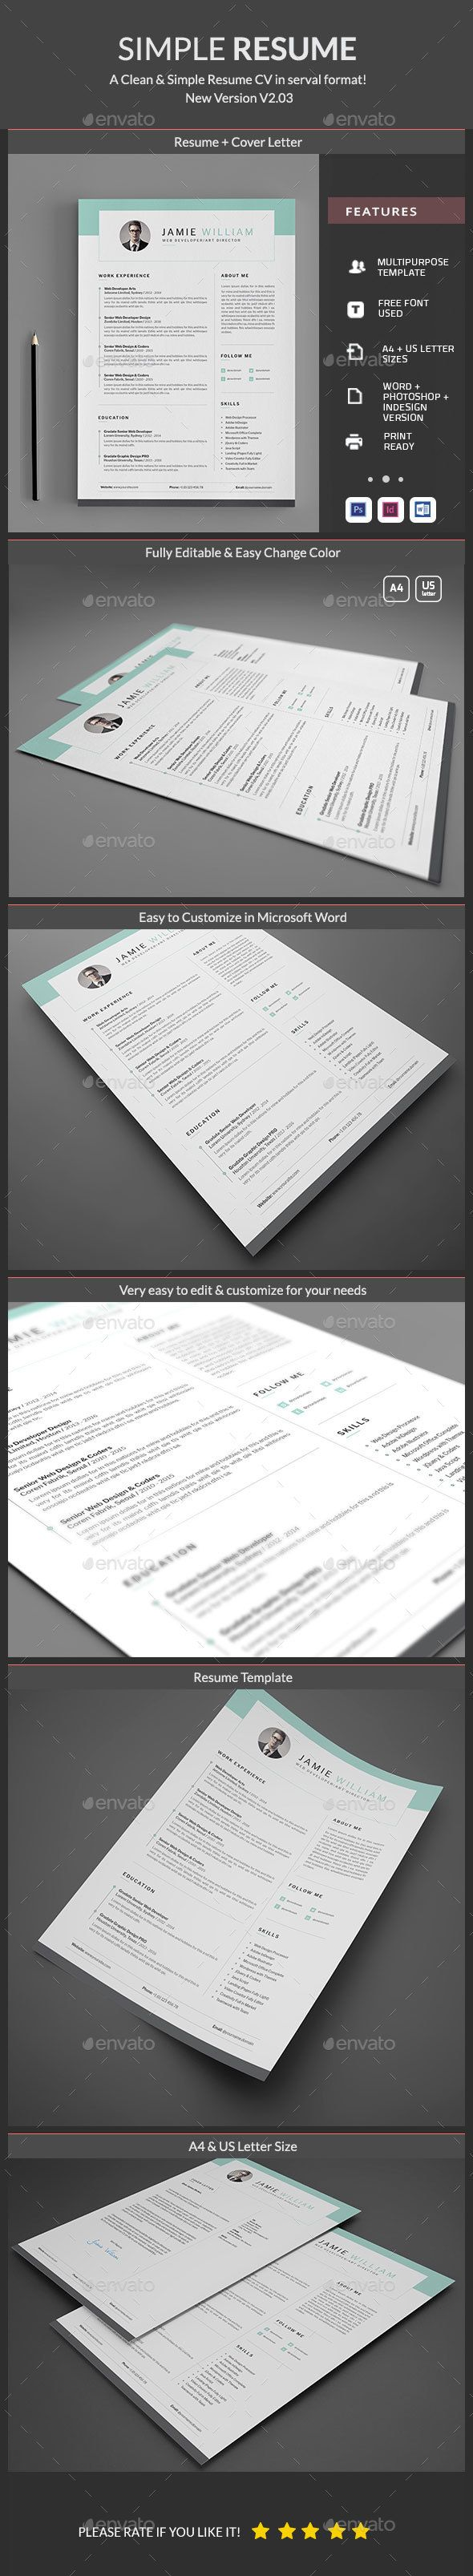 #Resume - Resumes Stationery Download here: https://graphicriver.net/item/resume/19685027?ref=Suz_562geid